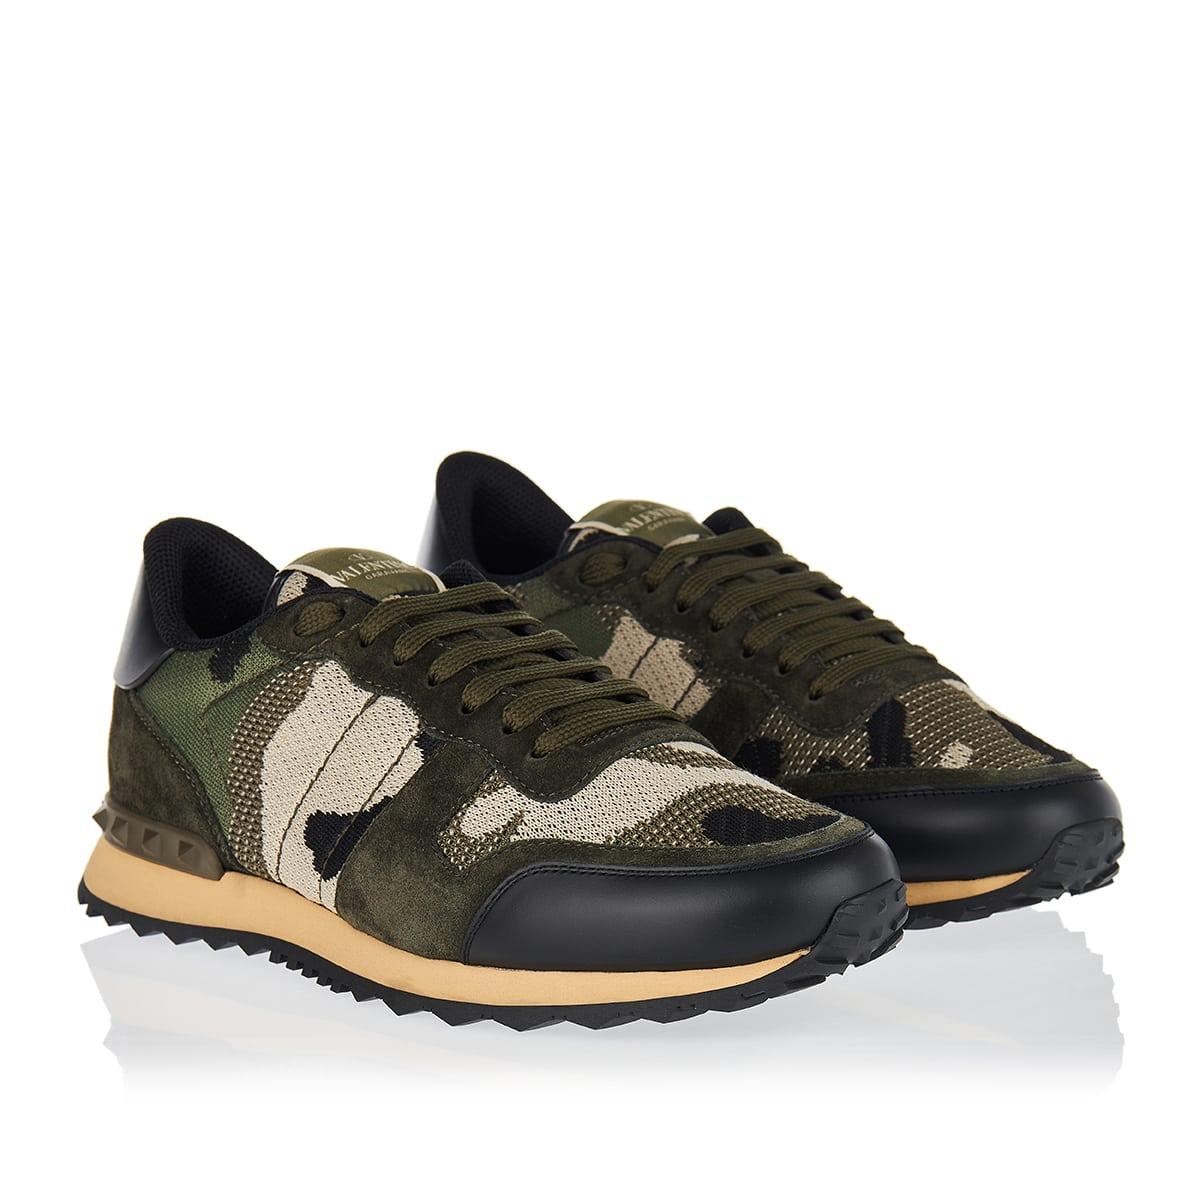 Camouflage Rockrunner mesh sneakers